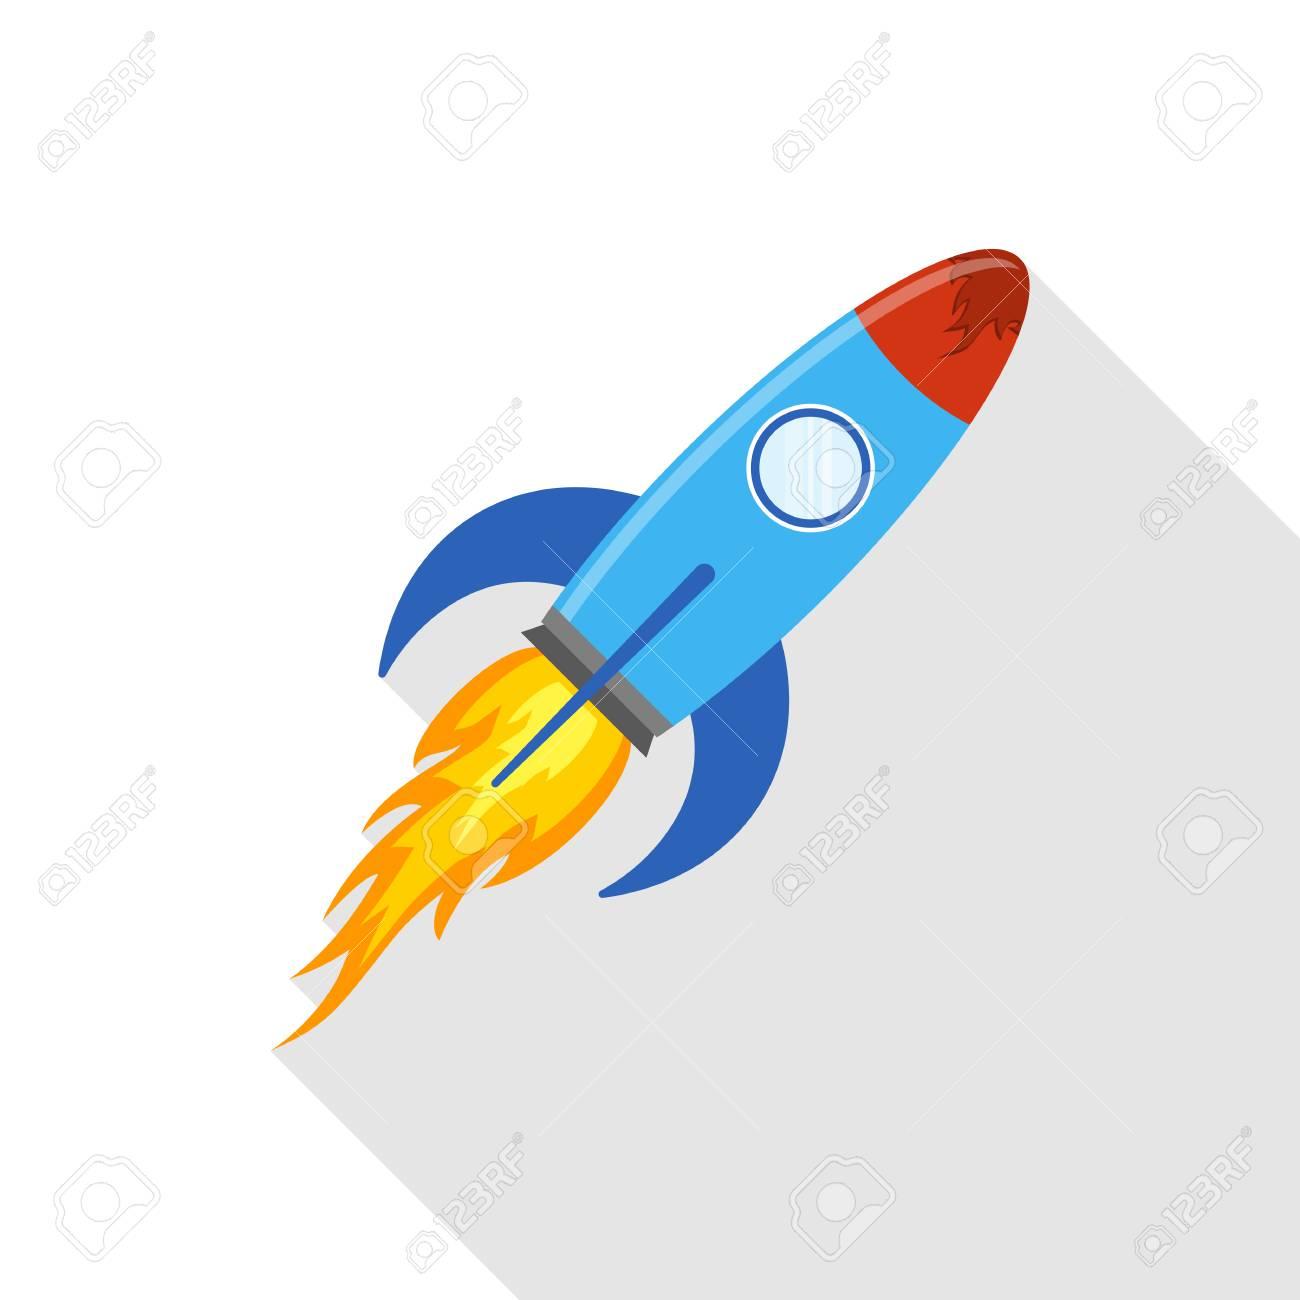 Spacecraft Spaceship Drawing Color